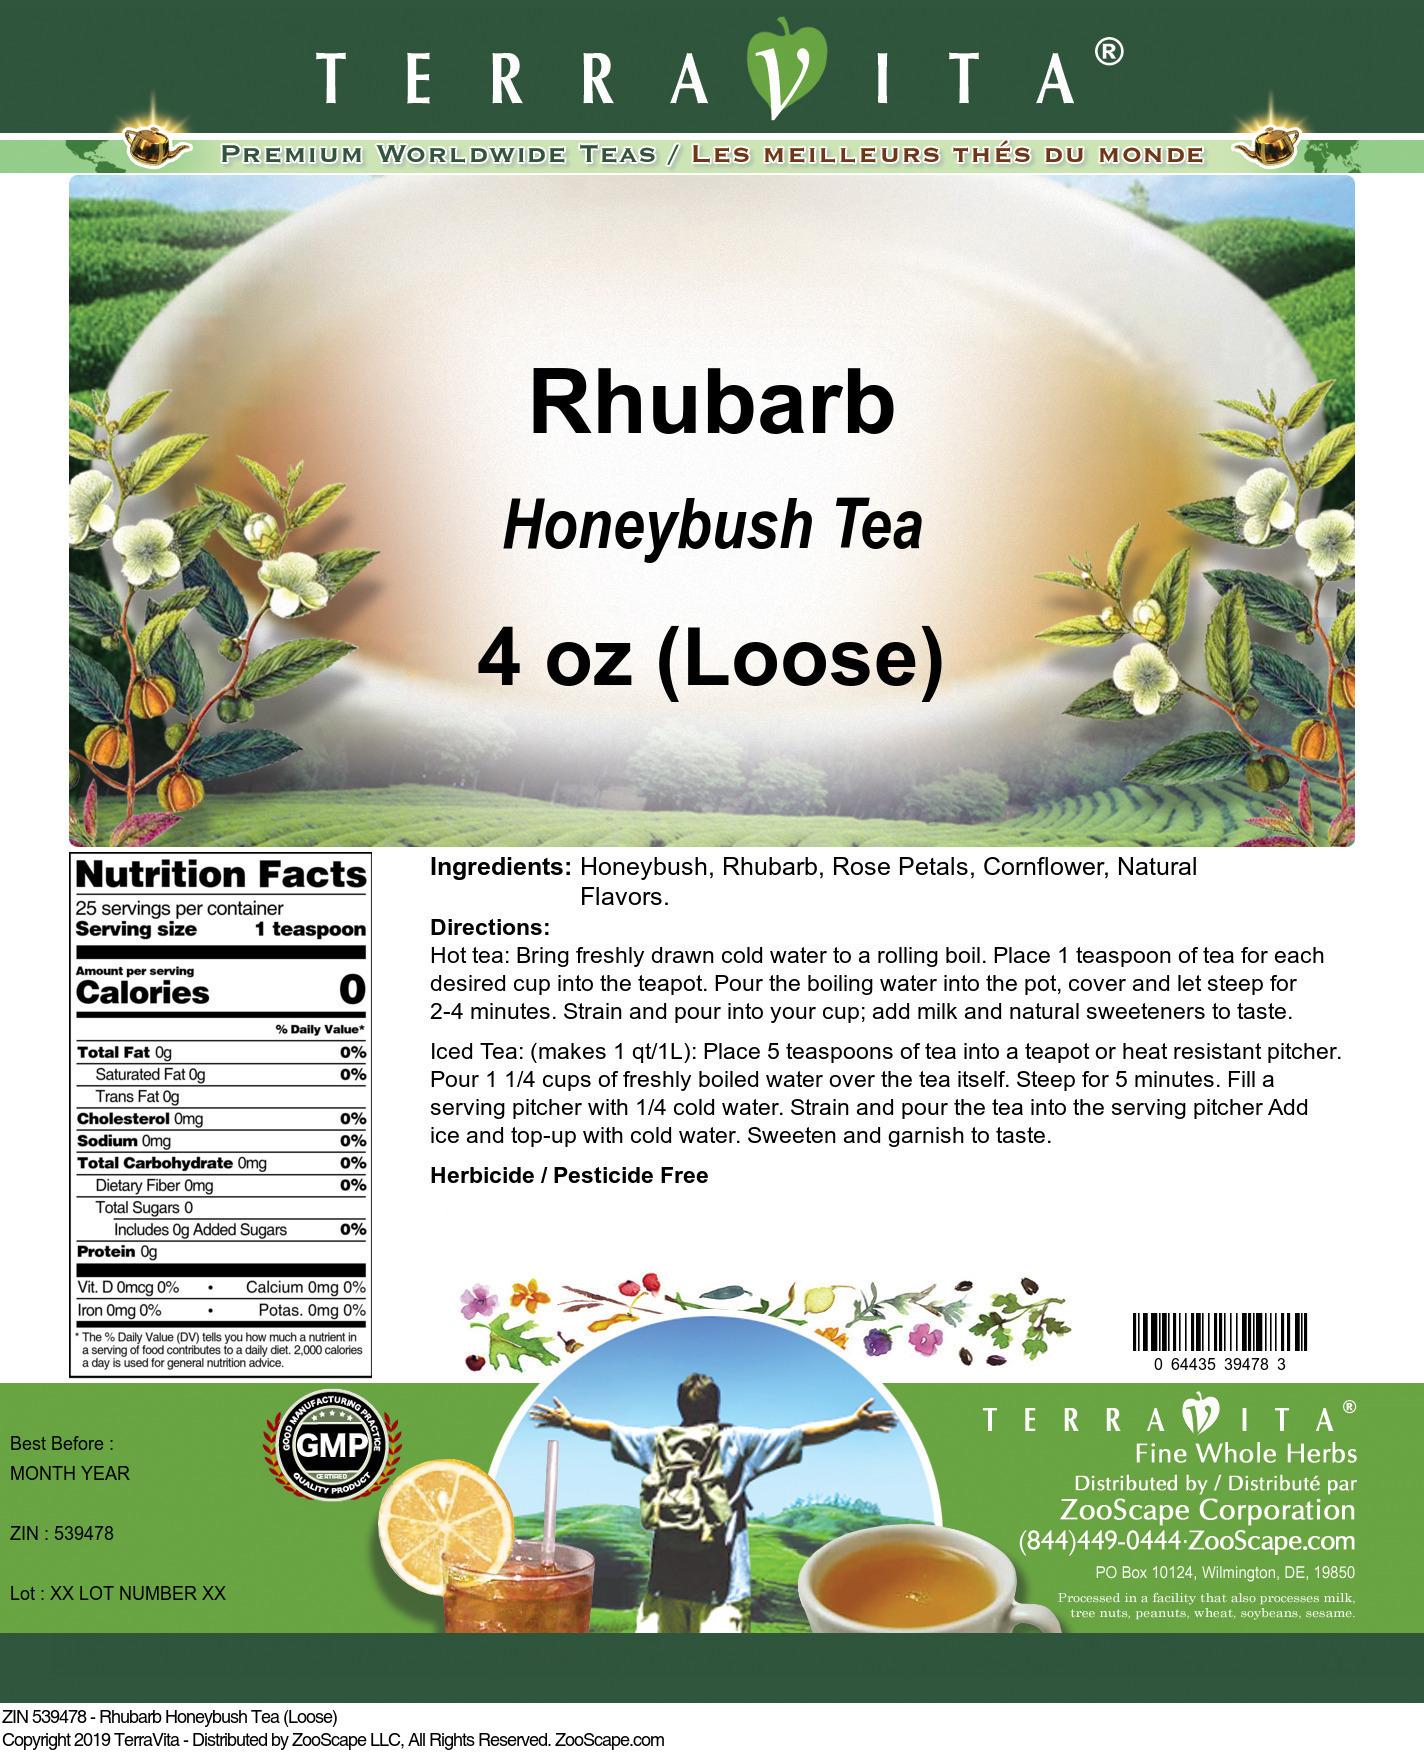 Rhubarb Honeybush Tea